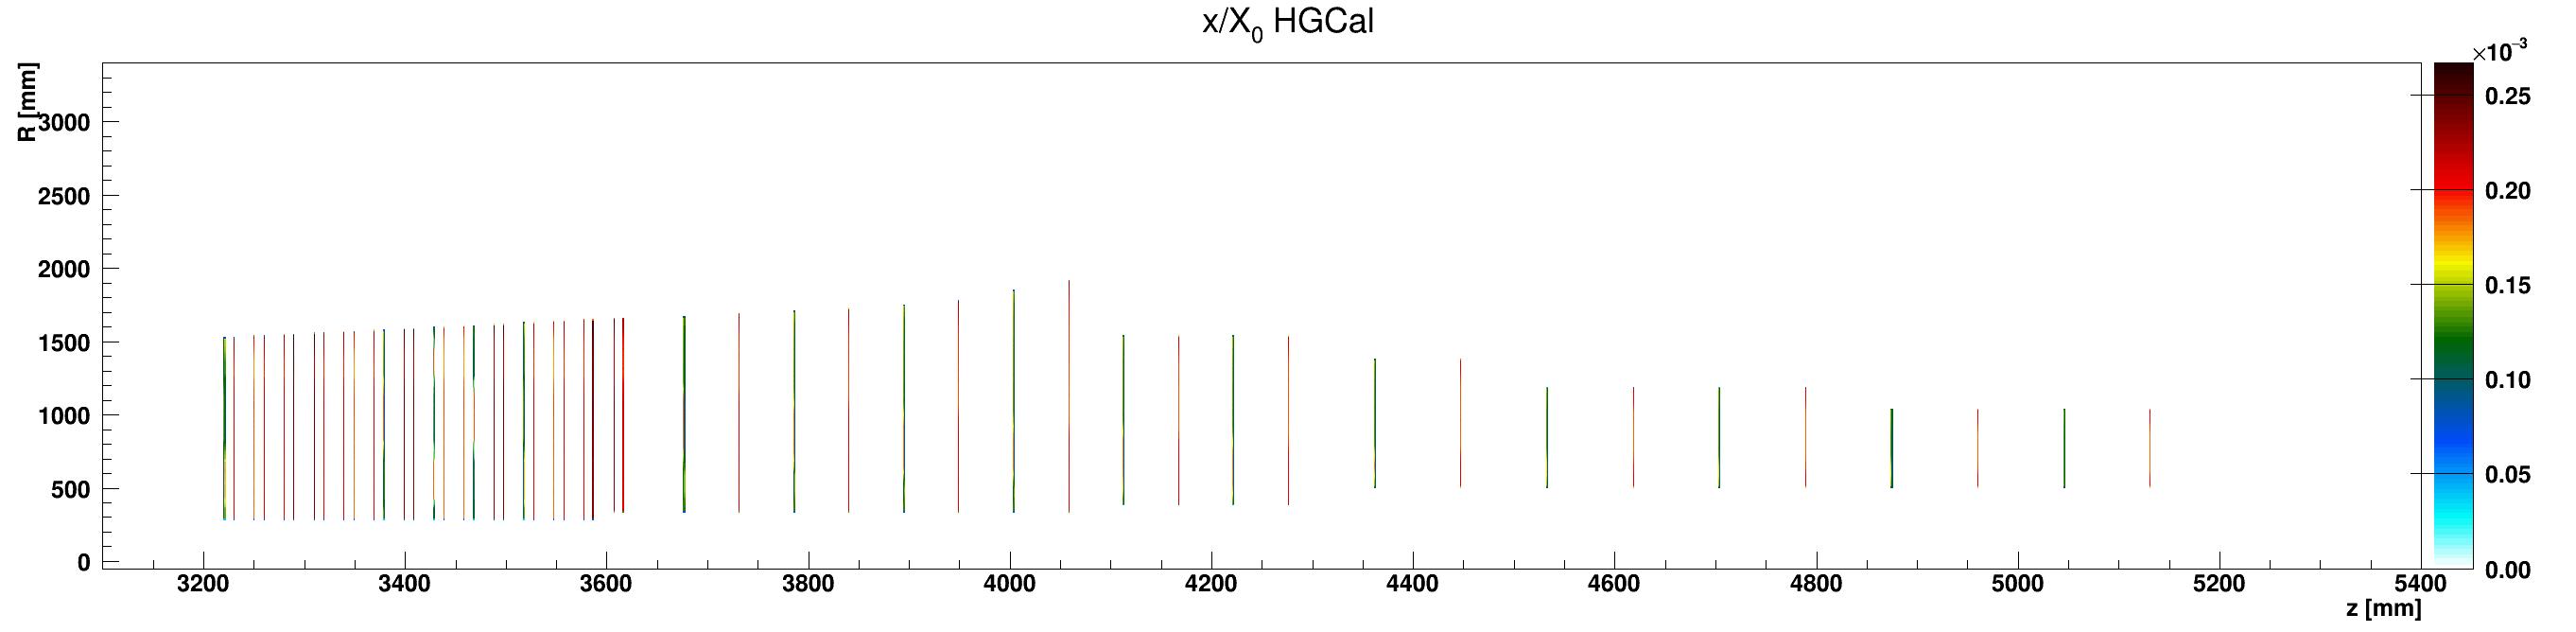 HGCal_x_vs_z_vs_RlocSilicon_ZplusZoom.png